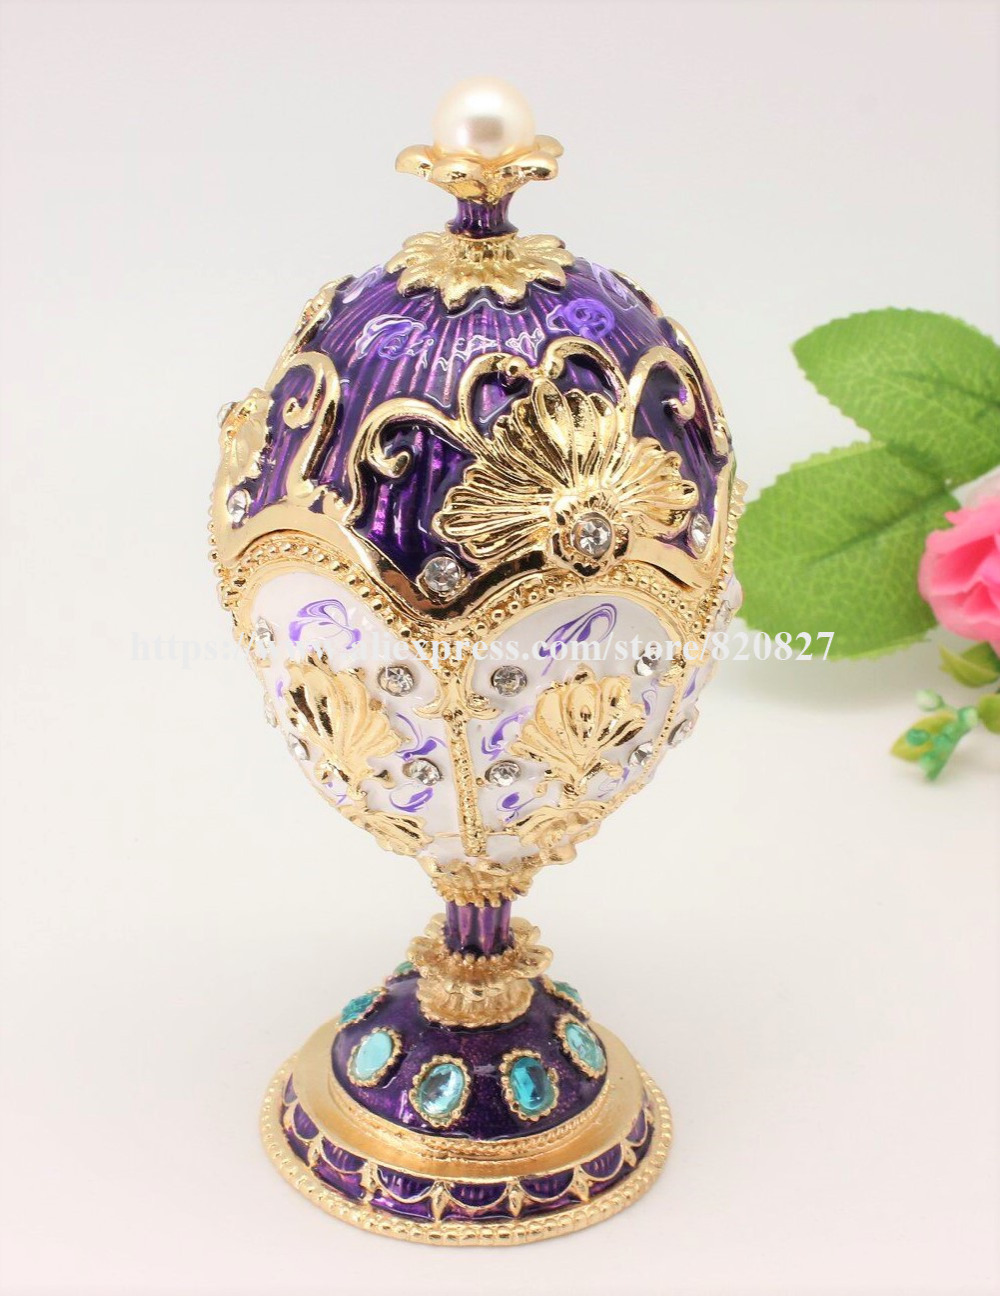 Faberge Style Egg Shaped Trinket Box Hinged Egg Ring Holder Pearl Egg Figurine Boxe Decor egg Jewelry Organizer Gift